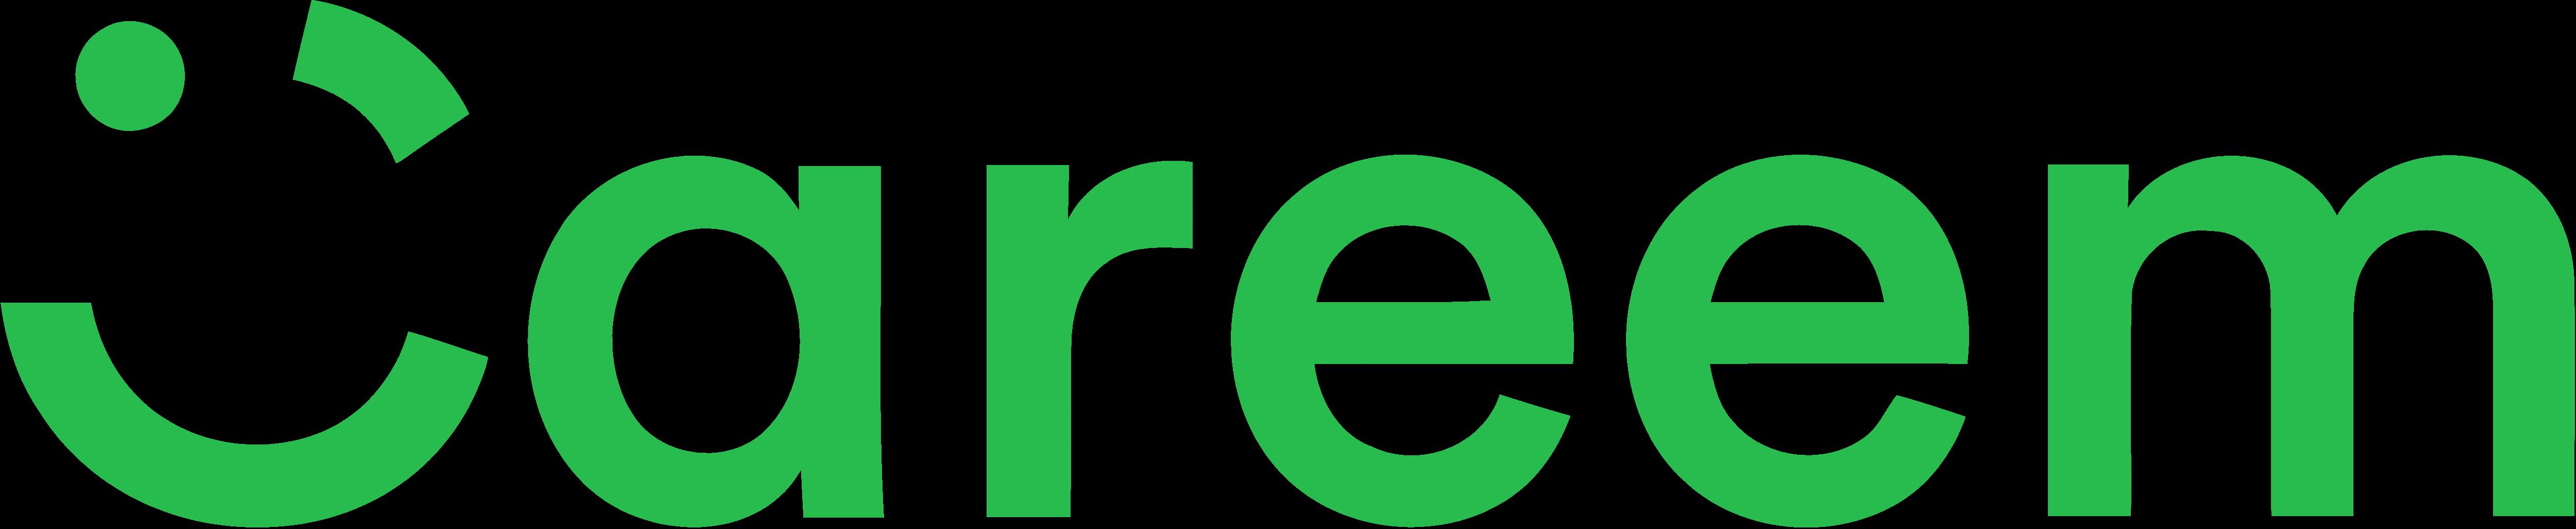 Careem Logos Download